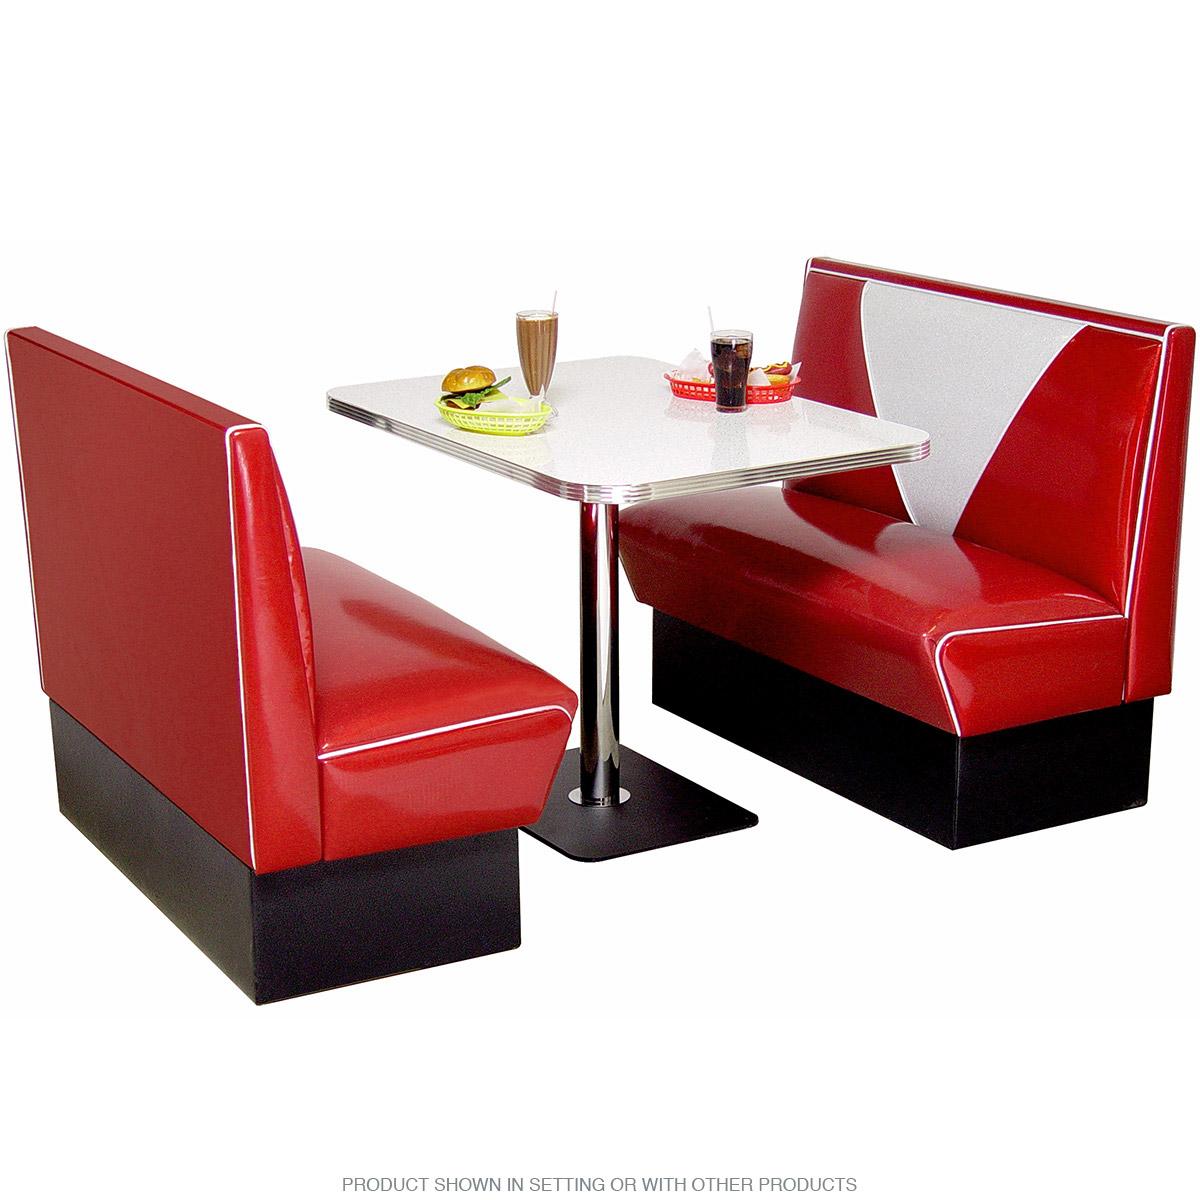 retro furniture offers in retro gifts and decor. KCZMUNJ